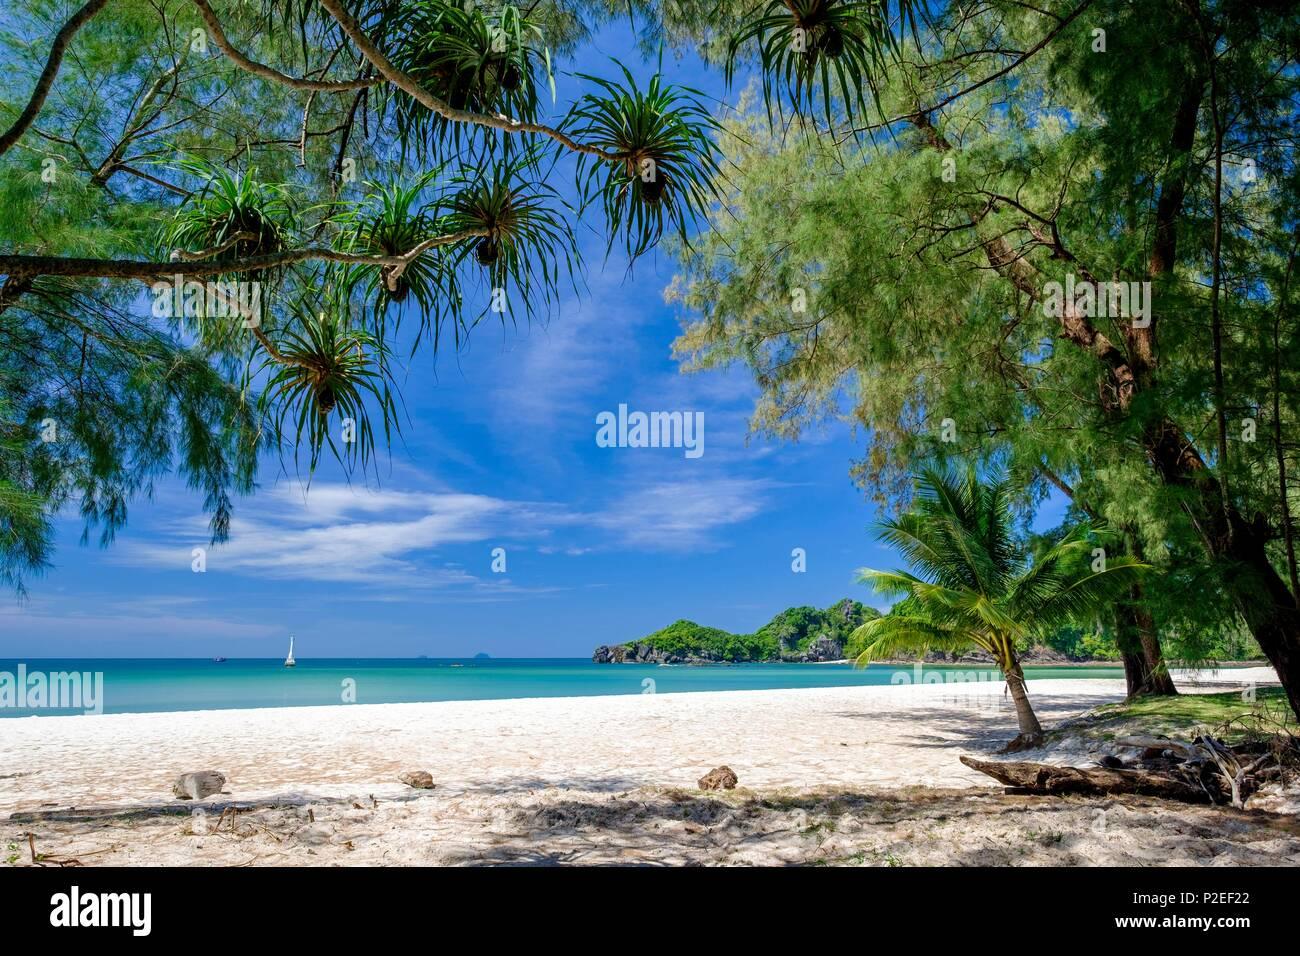 Thailand, Satun province, Tarutao National Marine Park, Ko Tarutao island, Ao Pante Malacca beach Stock Photo